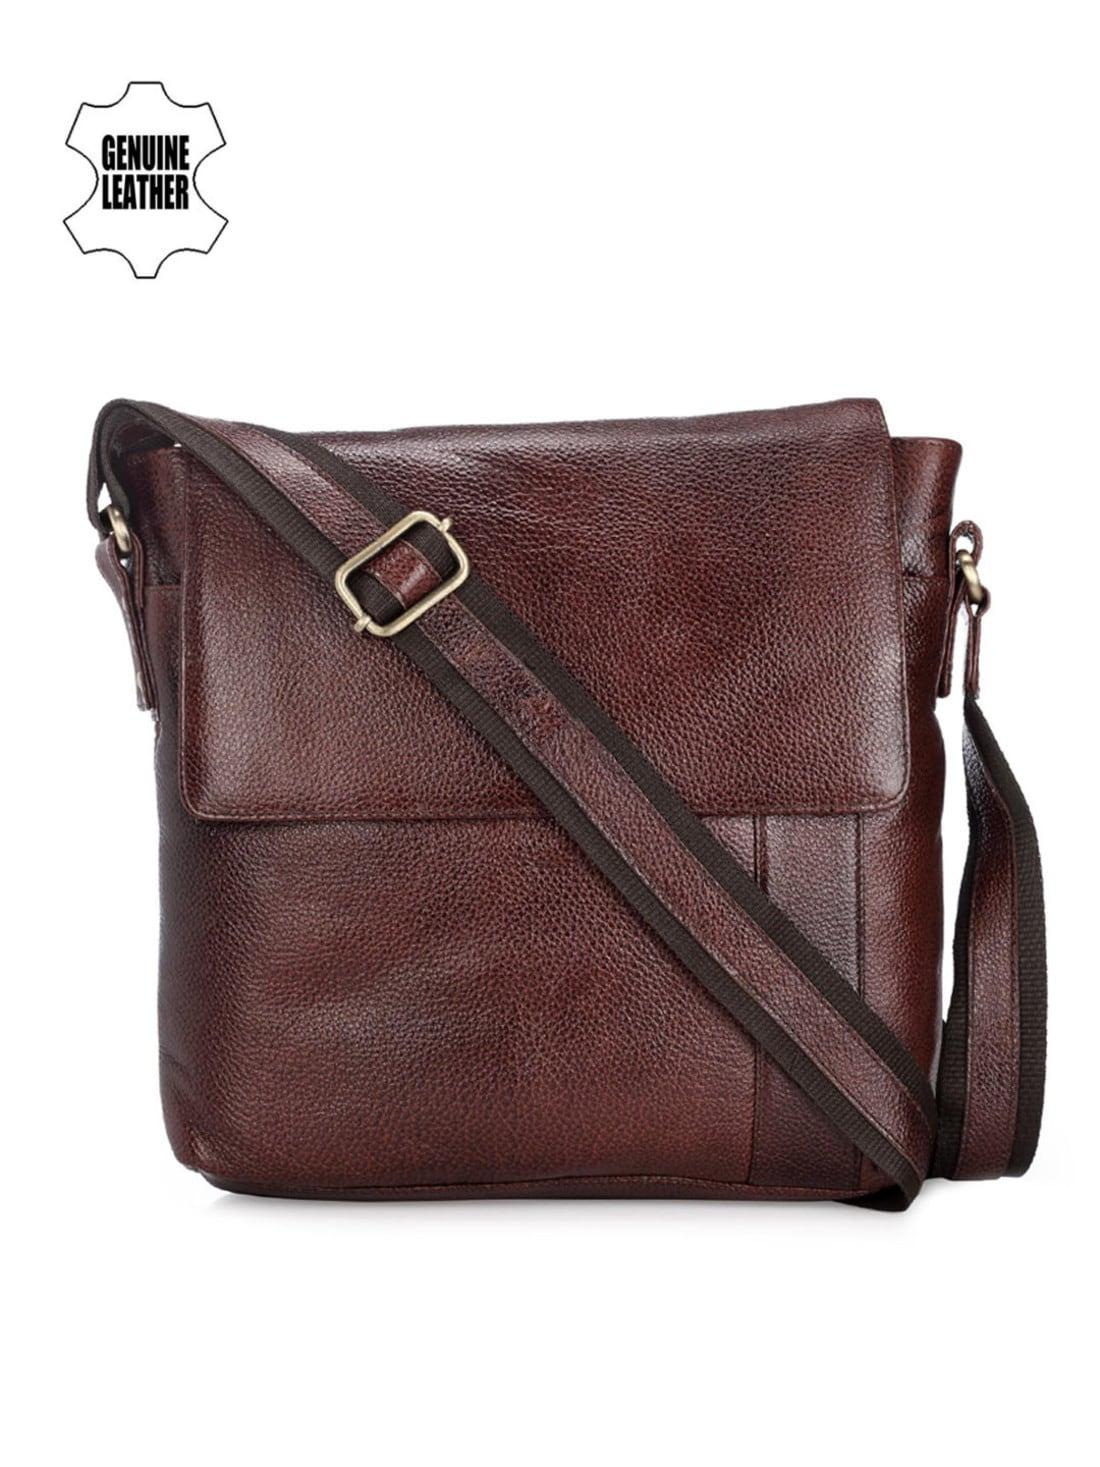 edaa209dd209 Messenger Bags - Buy Messenger Bags Online in India